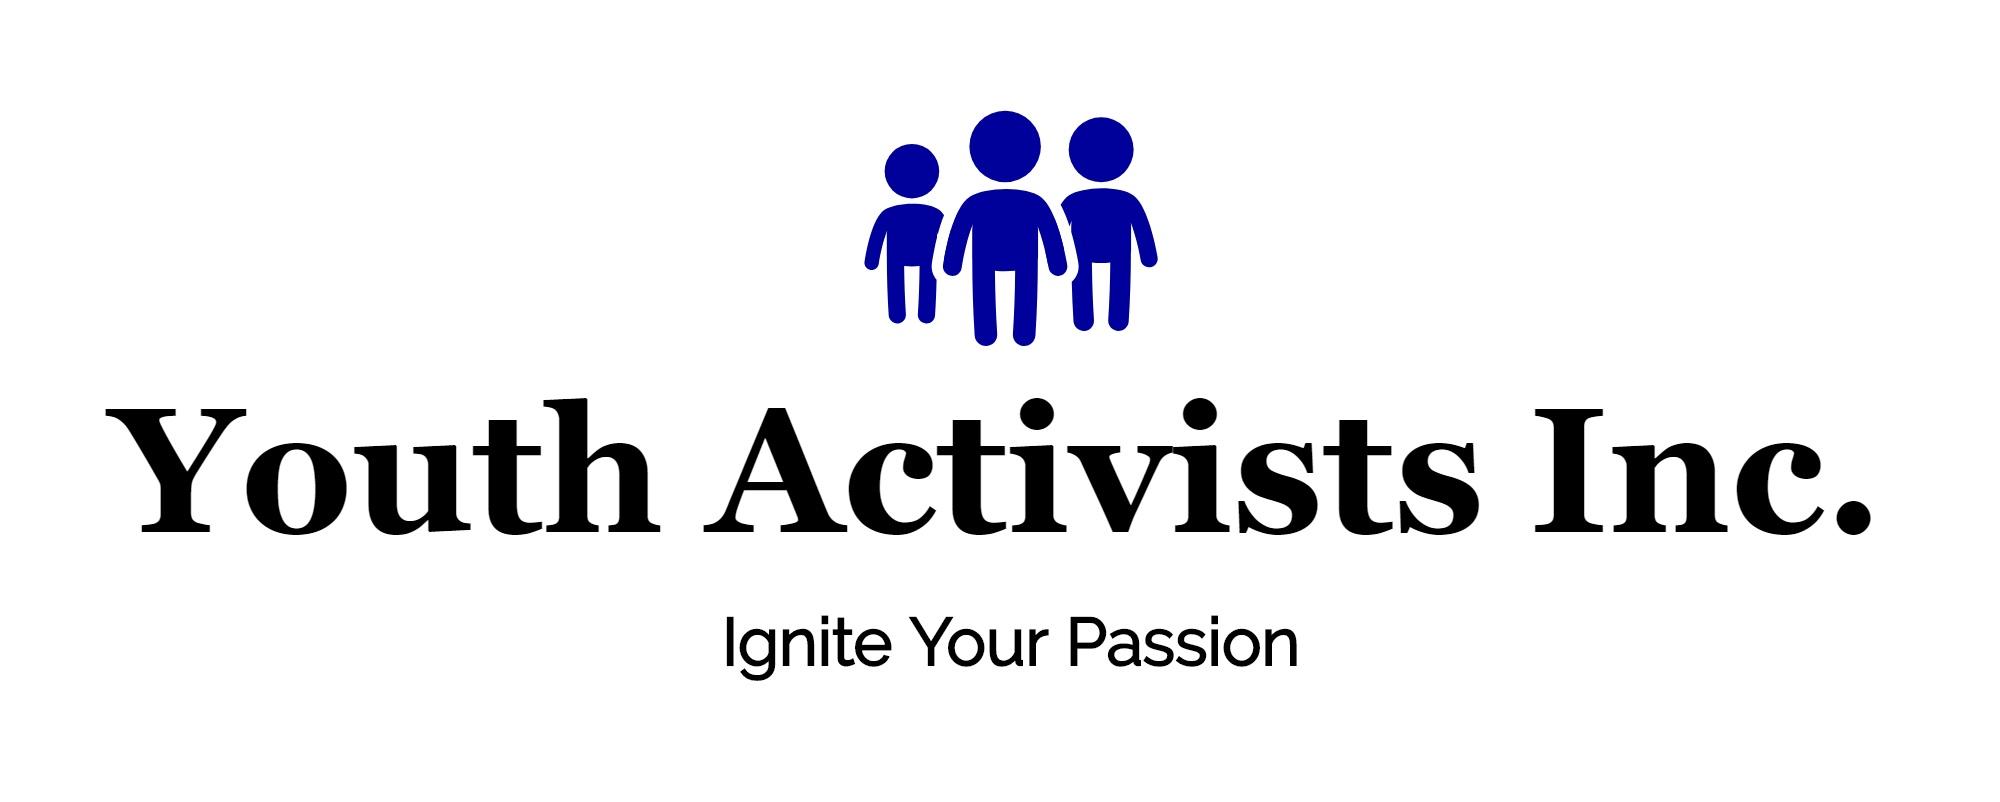 Youth+Activists+Inc.-logo.jpg